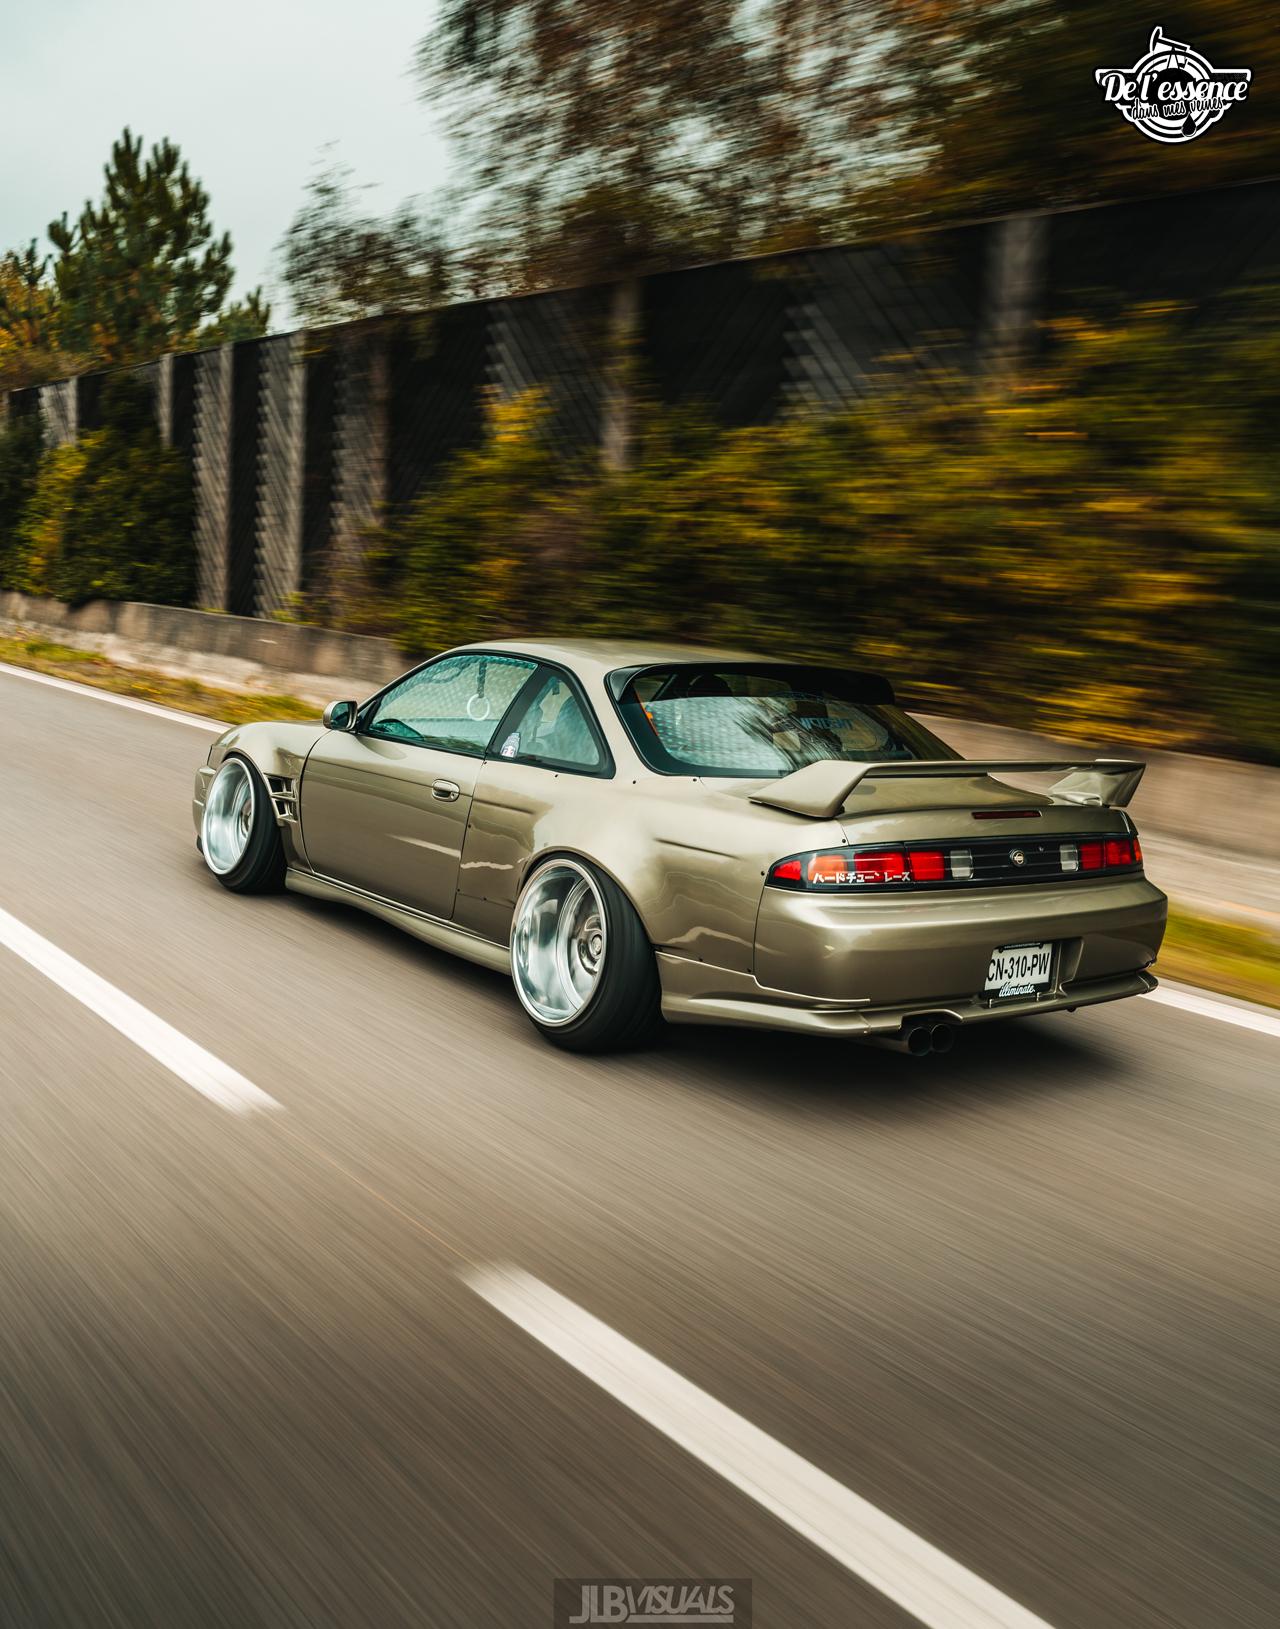 Nissan S14 Zenky - La belle Silvia ! 7